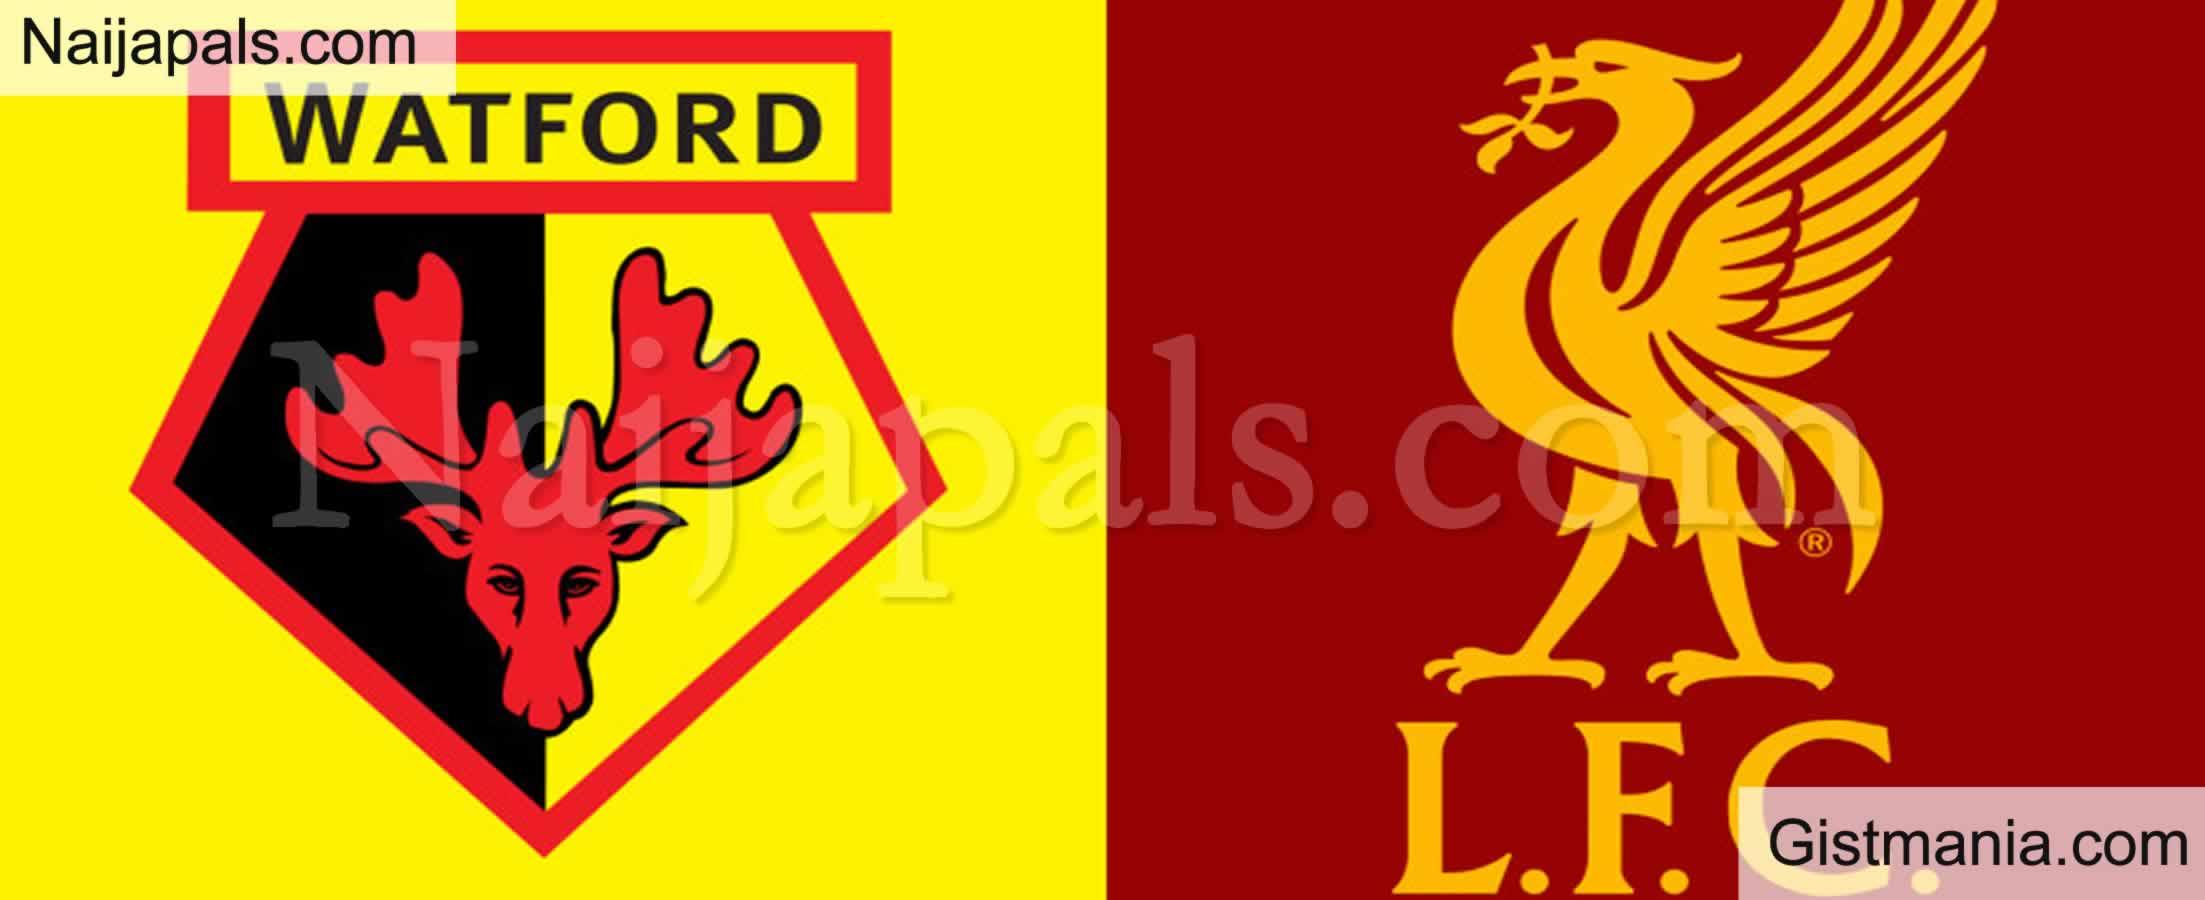 <img alt='.' class='lazyload' data-src='https://img.gistmania.com/emot/soccer.gif' /> <b>Watford v Liverpool : English Premier League Match, Team News, Goal Scorers and Stats</b>